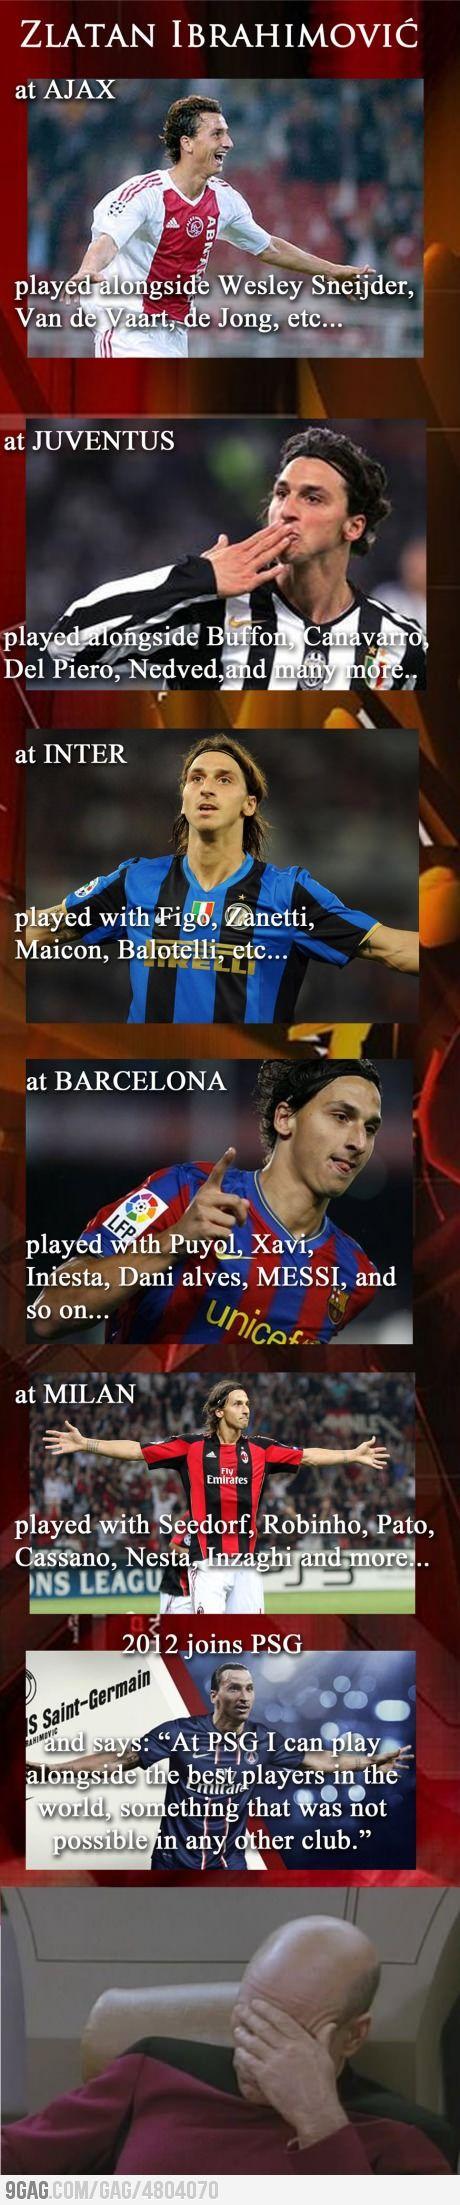 Zlatan Ibrahimovic.. Seriously?!